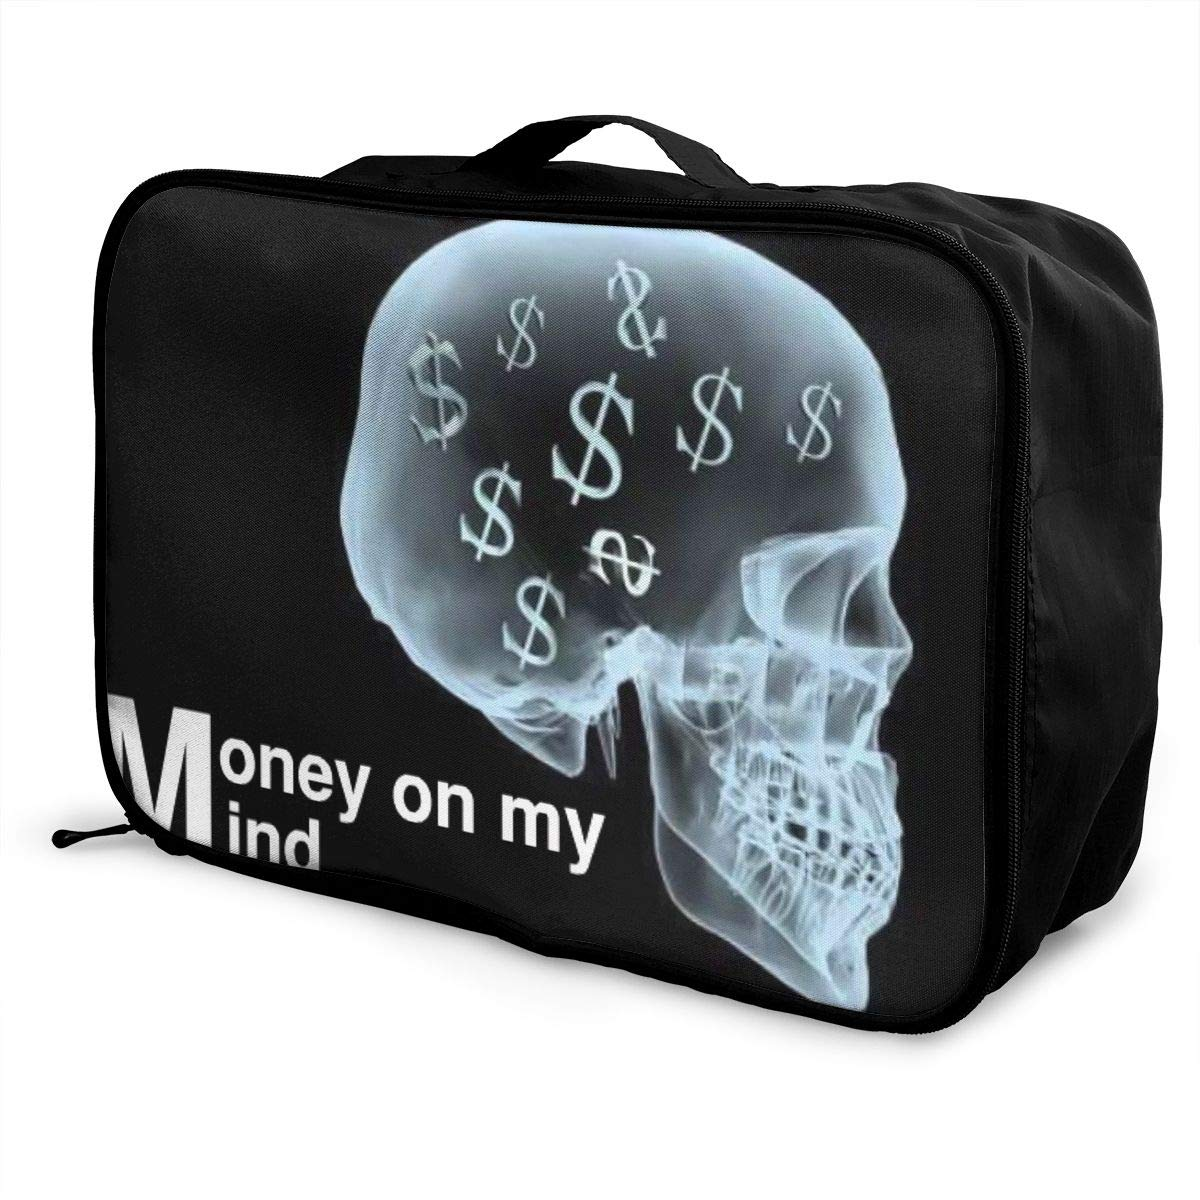 Travel Luggage Duffle Bag Lightweight Portable Handbag Money On My Mind Skull Large Capacity Waterproof Foldable Storage Tote